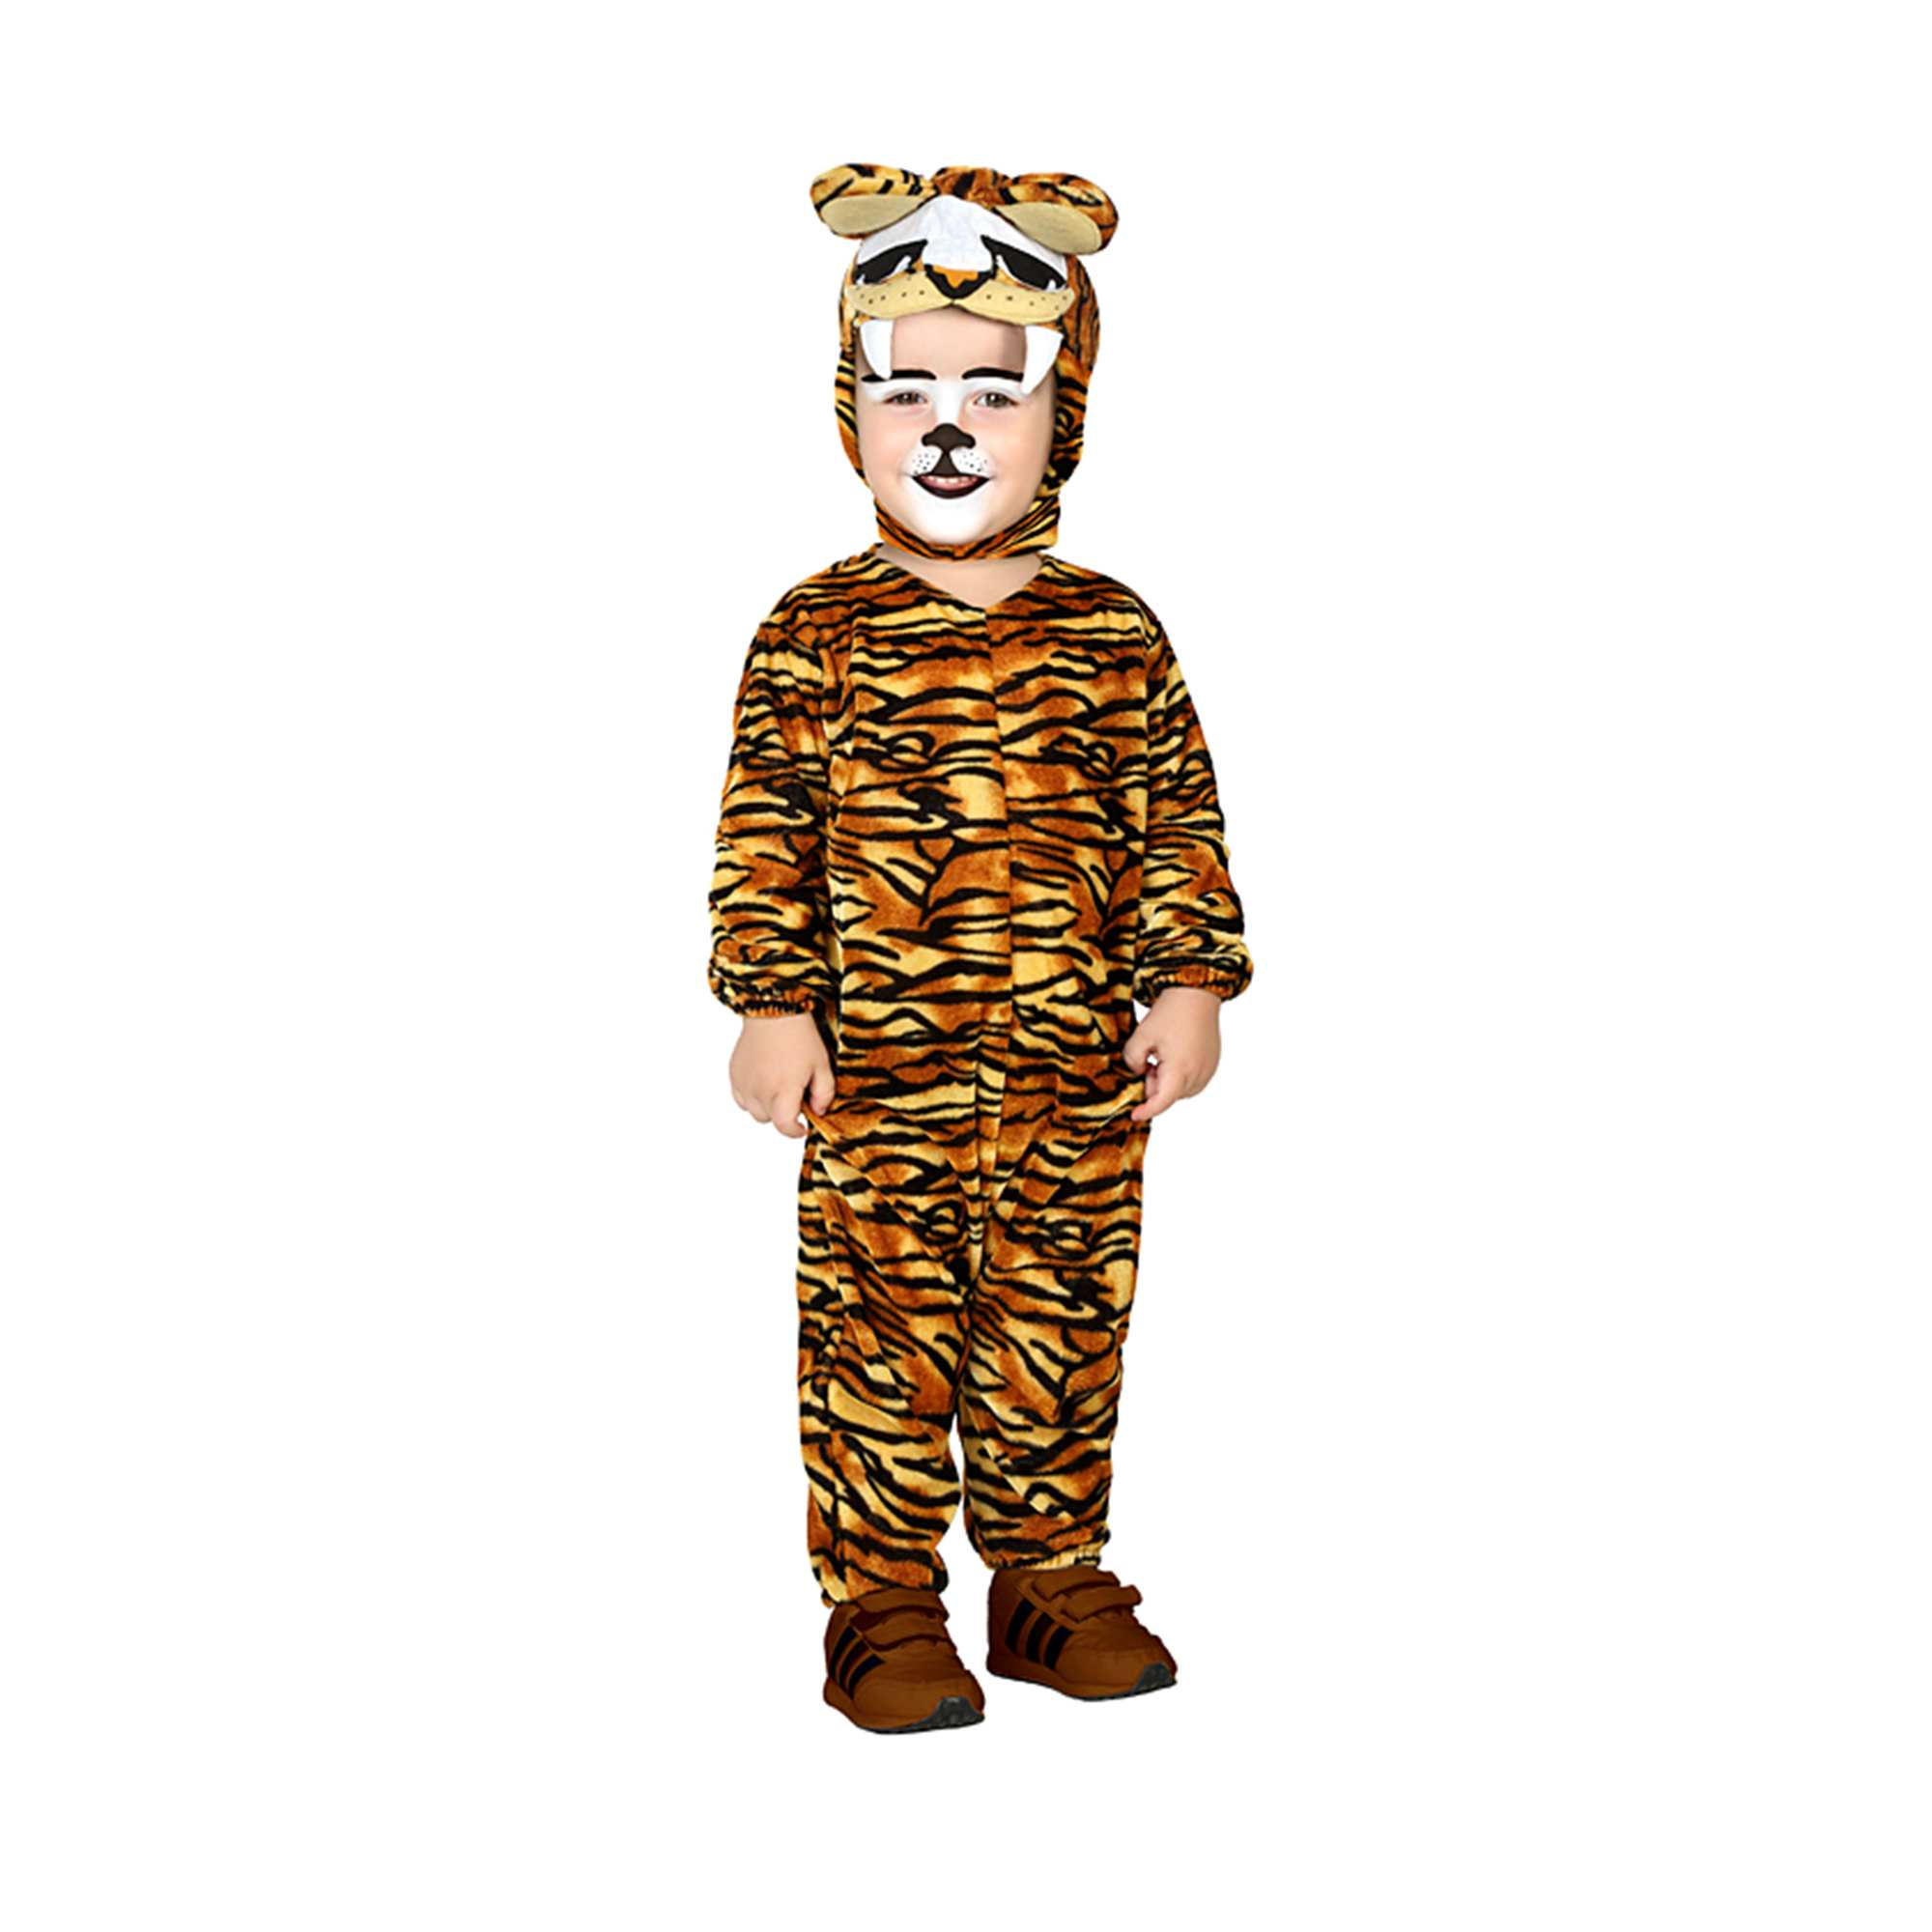 dc66425373183 Déguisement tigre Bébé - marron jaune - Kiabi - 15